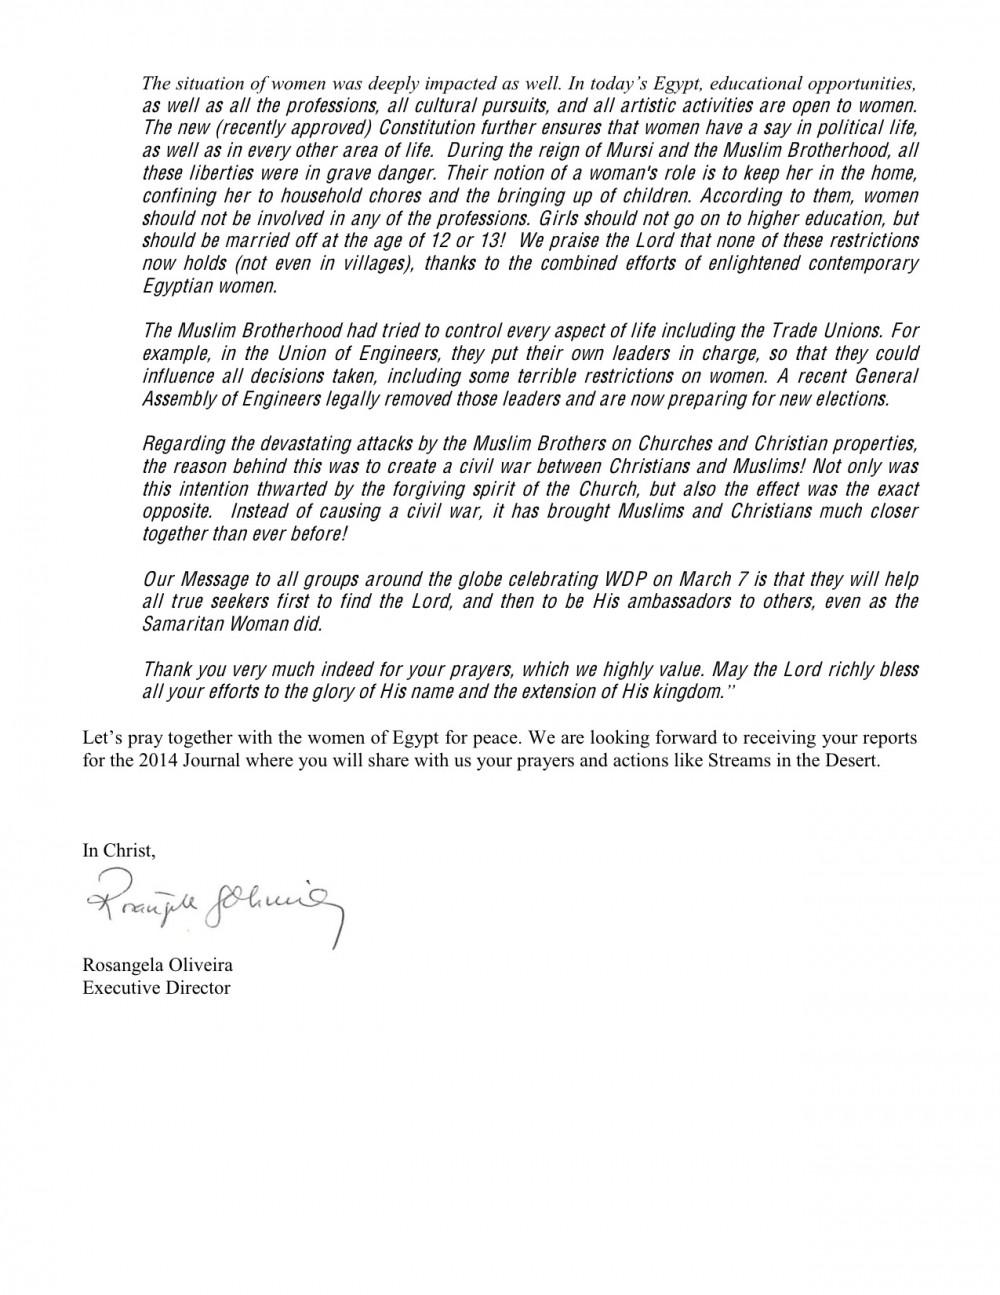 2014-13-2-WDP-Egypt-Message